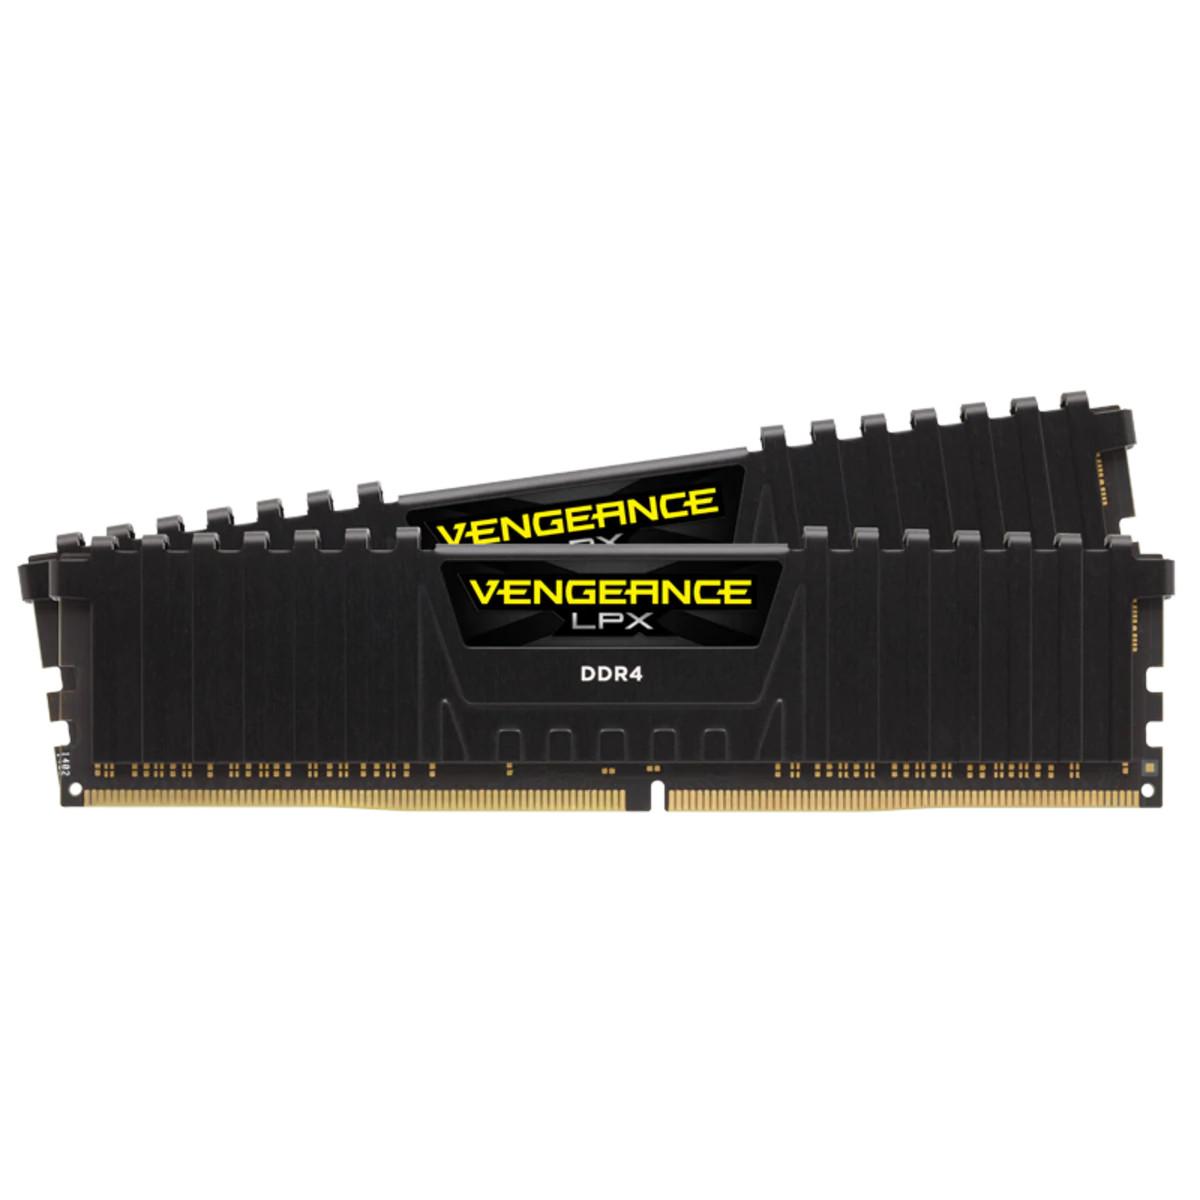 Bộ nhớ ram gắn trong Corsair DDR4, 3000MHz 32GB (2x16GB) 2 x 288 DIMM, Vengeance LPX Black Heat spreader, 1.2V, XMP 2.0 đen